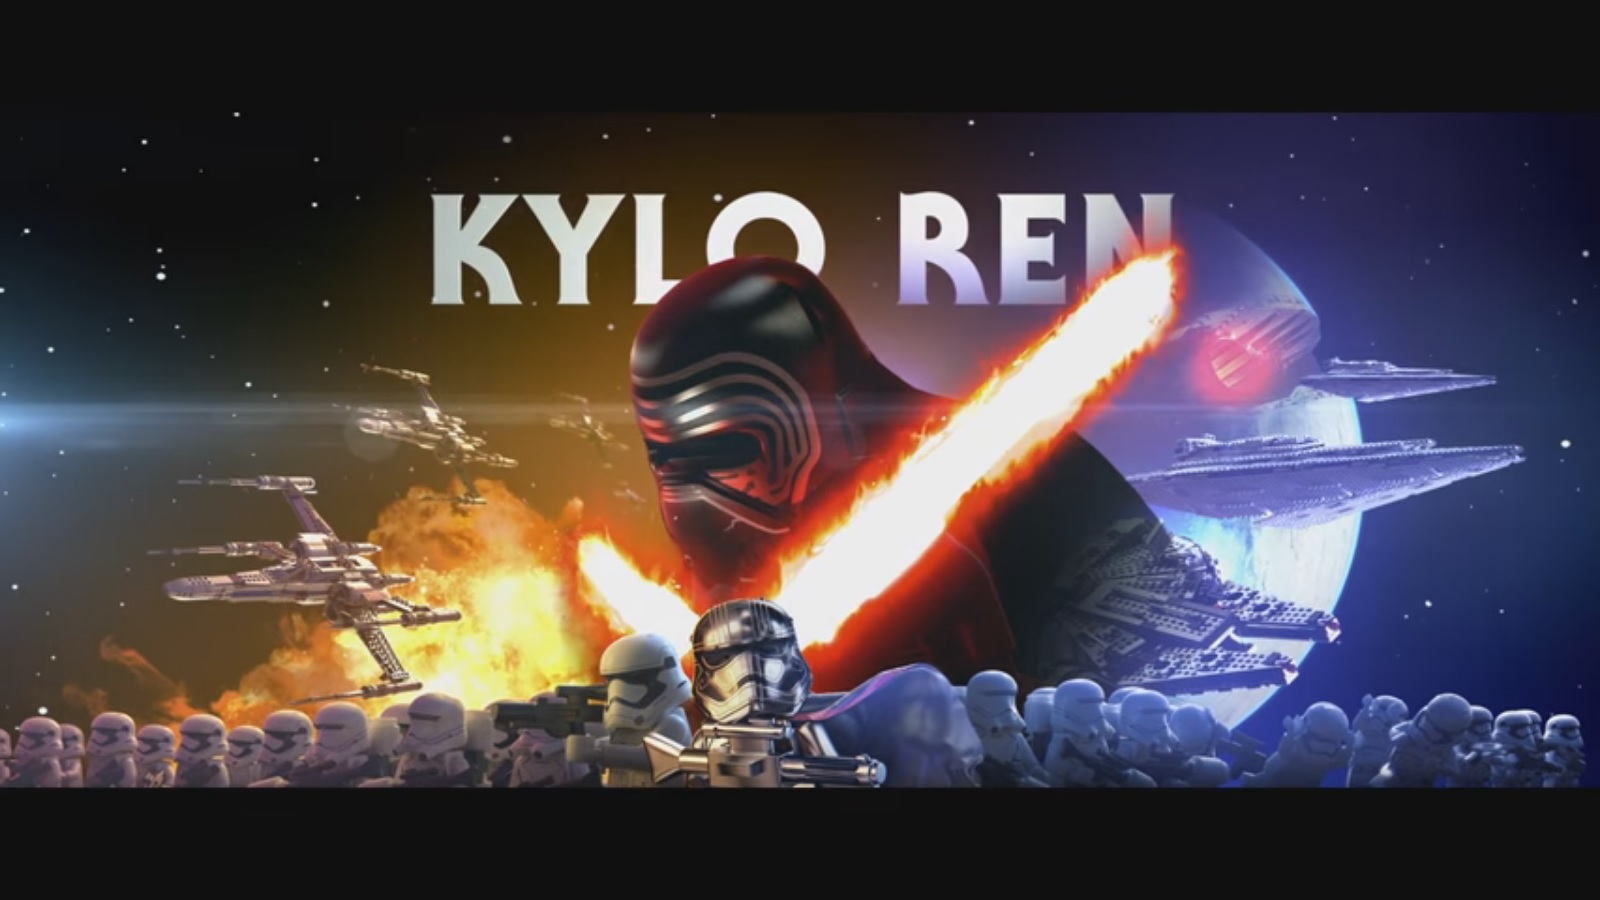 Lego Star Wars The Force Awakens Kylo Ren Character Vignette